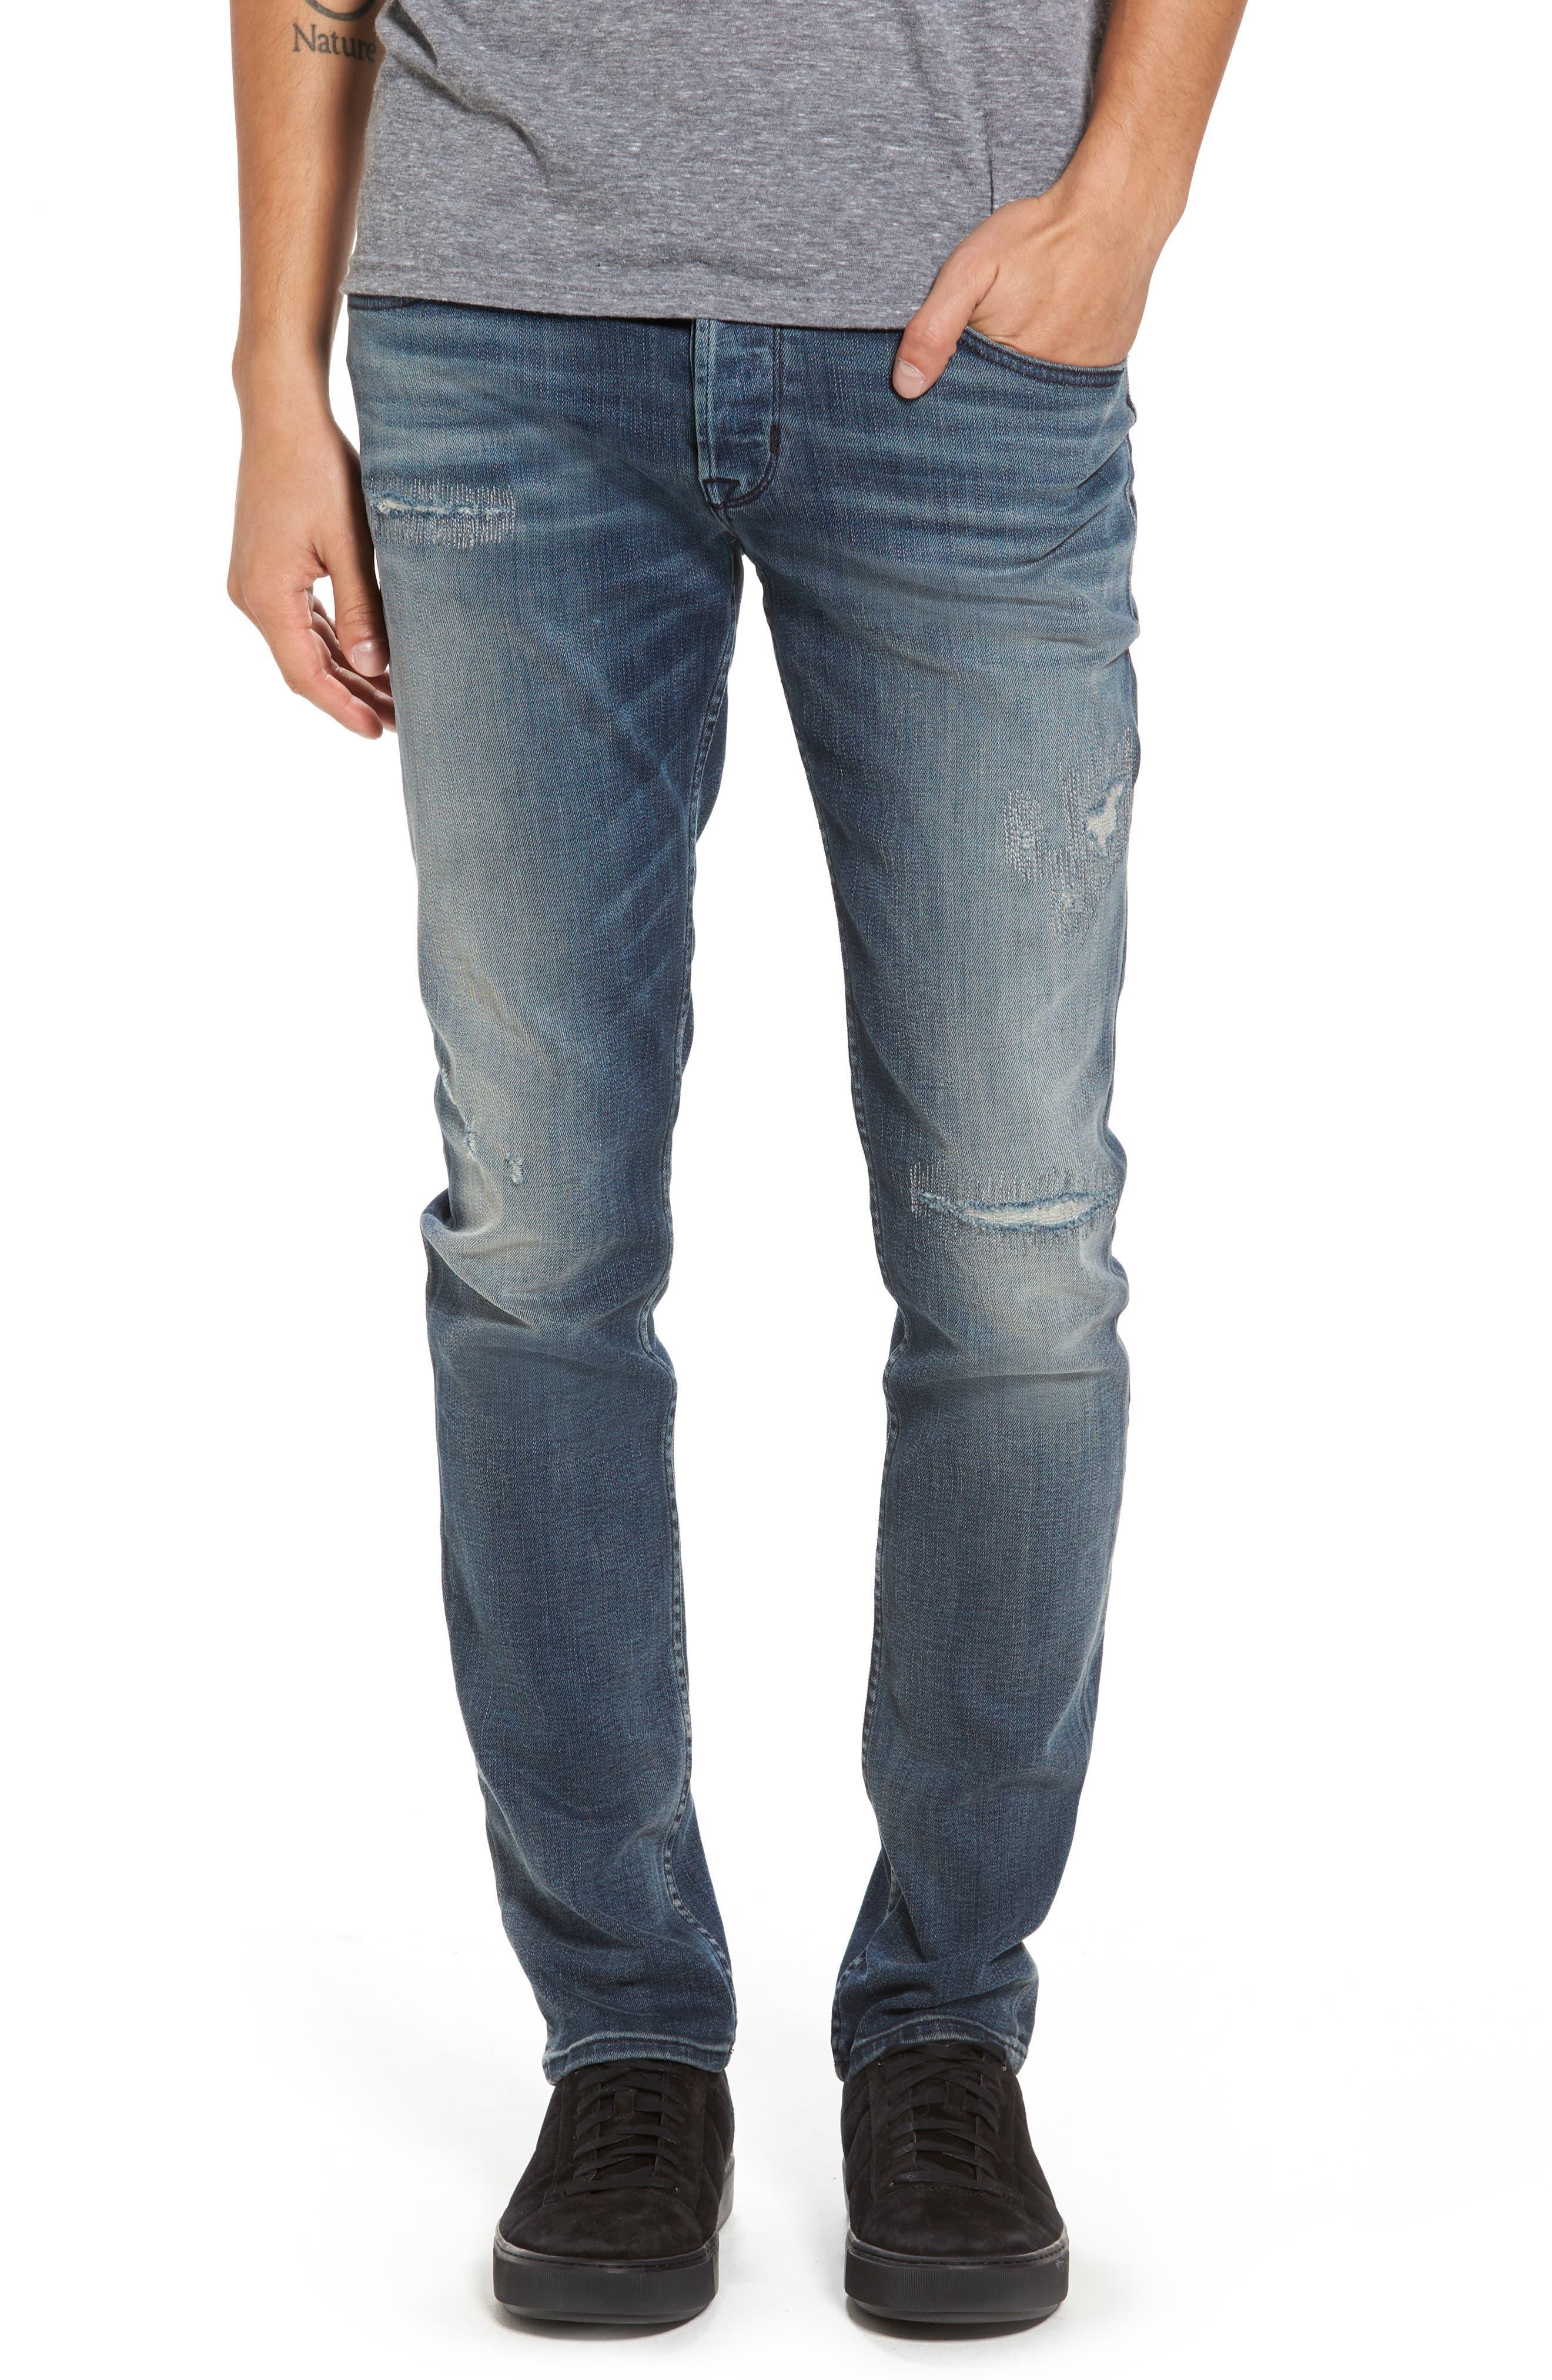 Hudson Jeans Axl Skinny Fit Jeans (Battery)